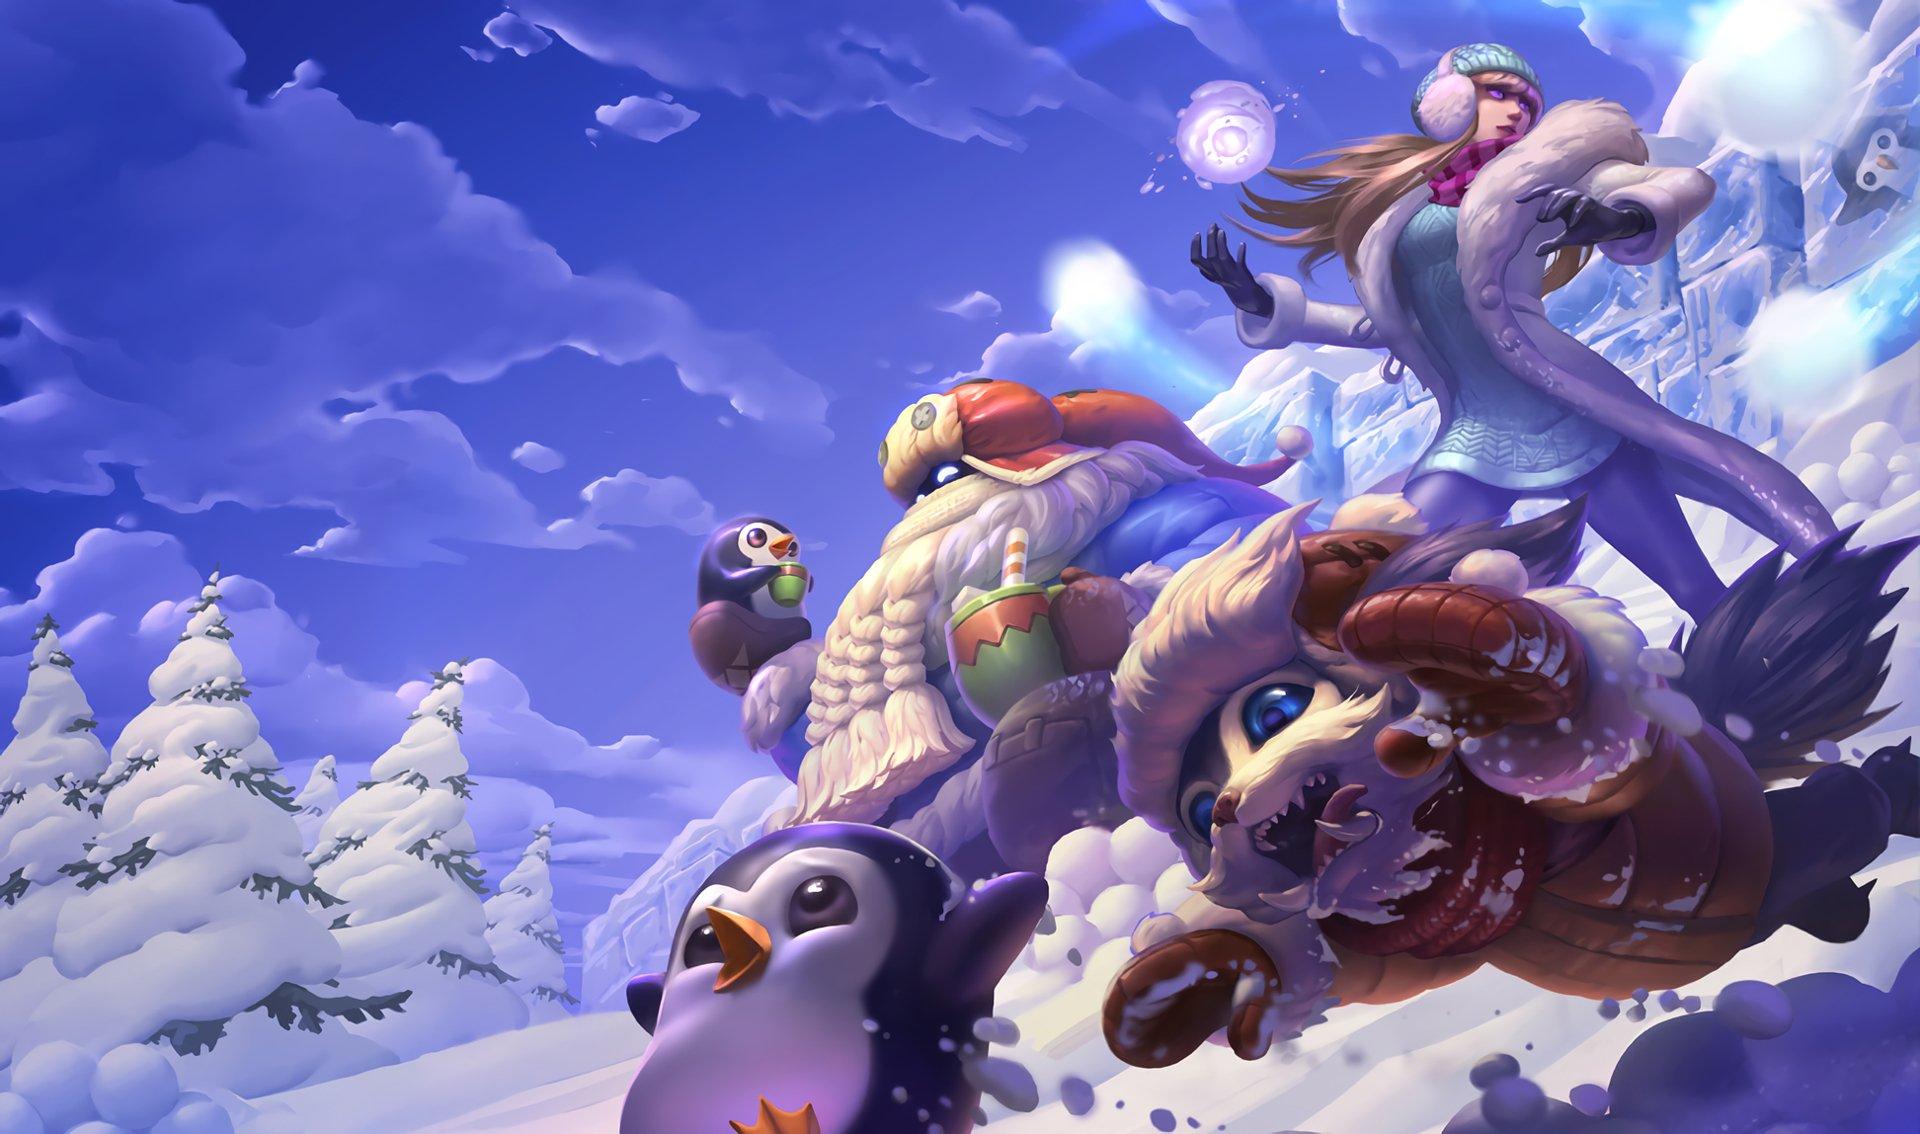 8 Bard (League Of Legends) HD Wallpapers | Backgrounds - Wallpaper